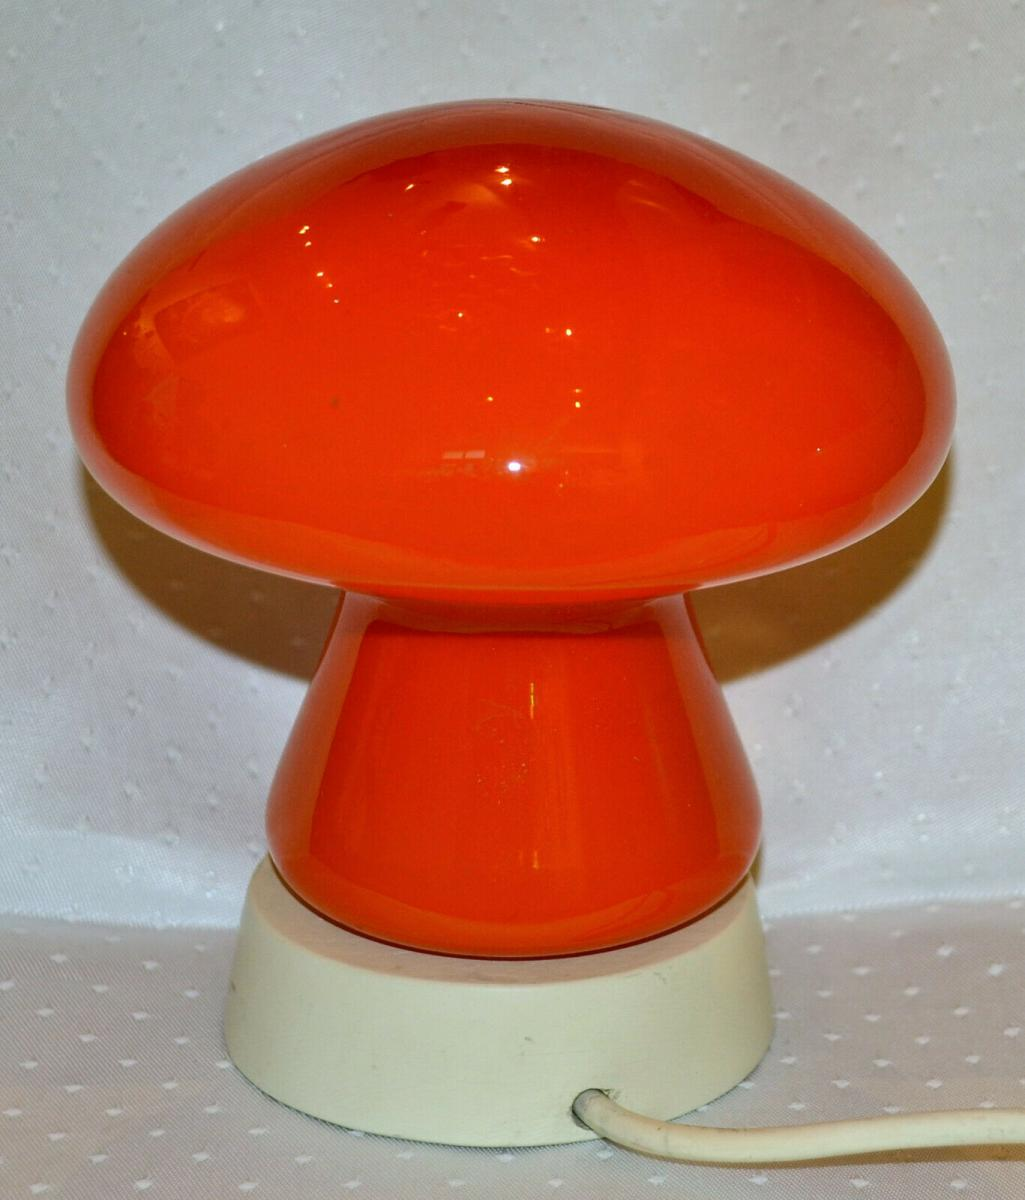 Tischlampe,Pilz,1950,rotes Glas,wohl Italien 0